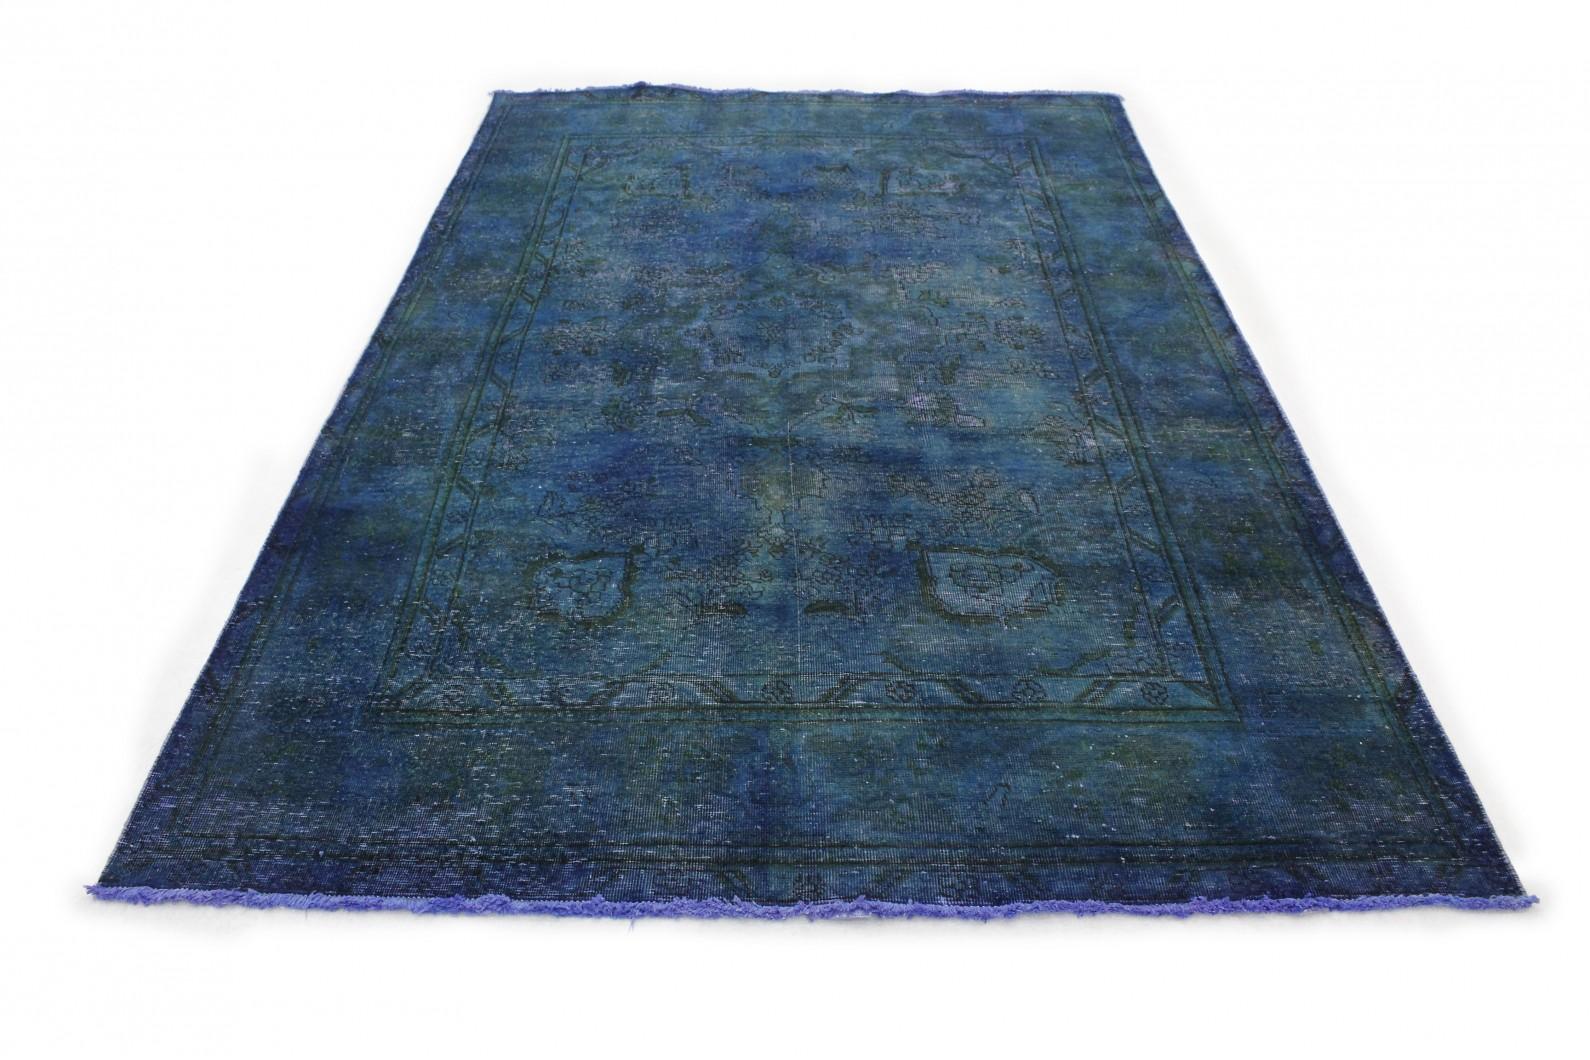 vintage teppich blau in 300x190 1001 177255 bei. Black Bedroom Furniture Sets. Home Design Ideas